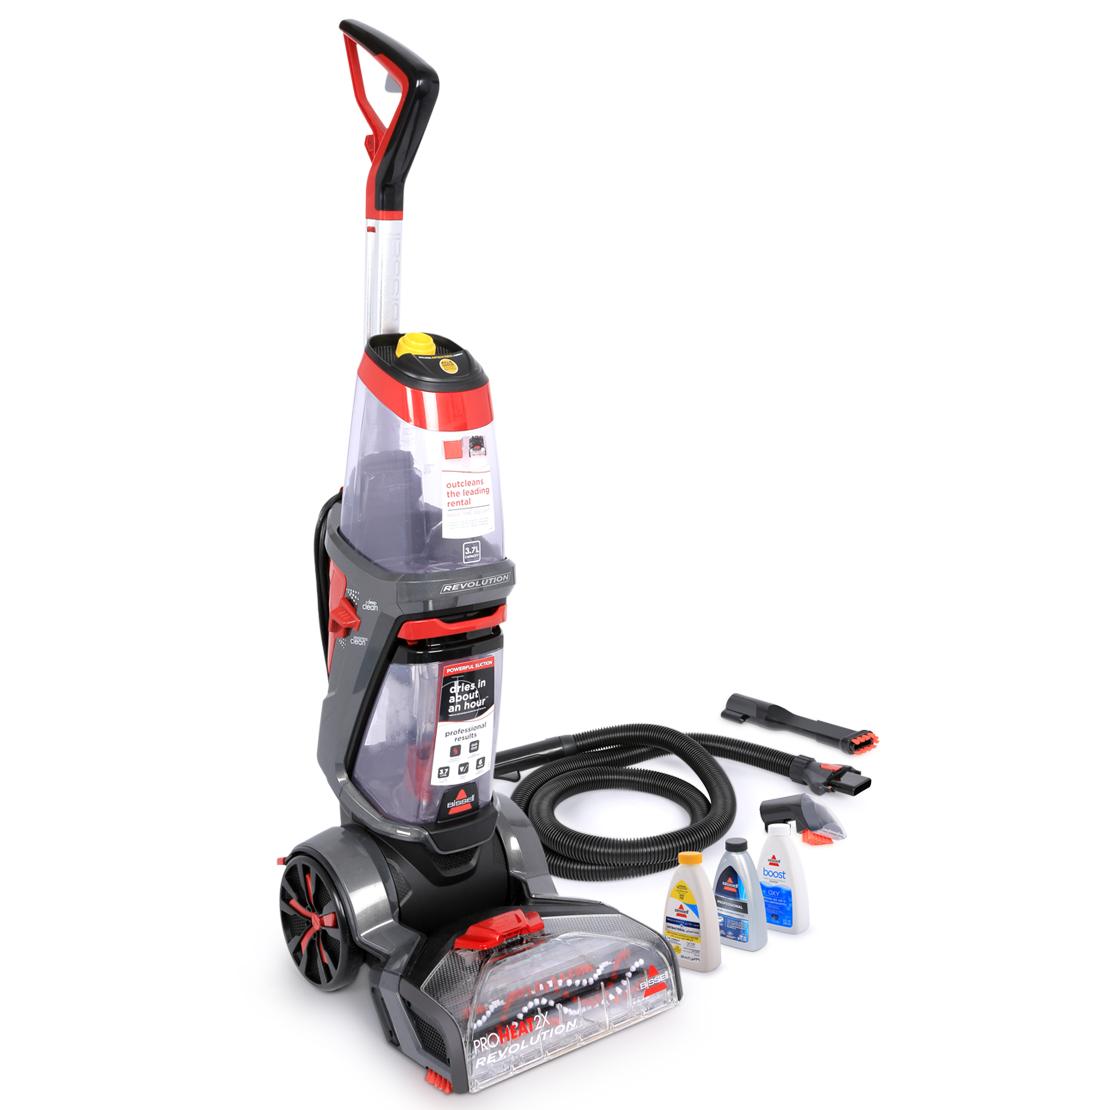 Pro Heat 2X Revolution Carpet Cleaner